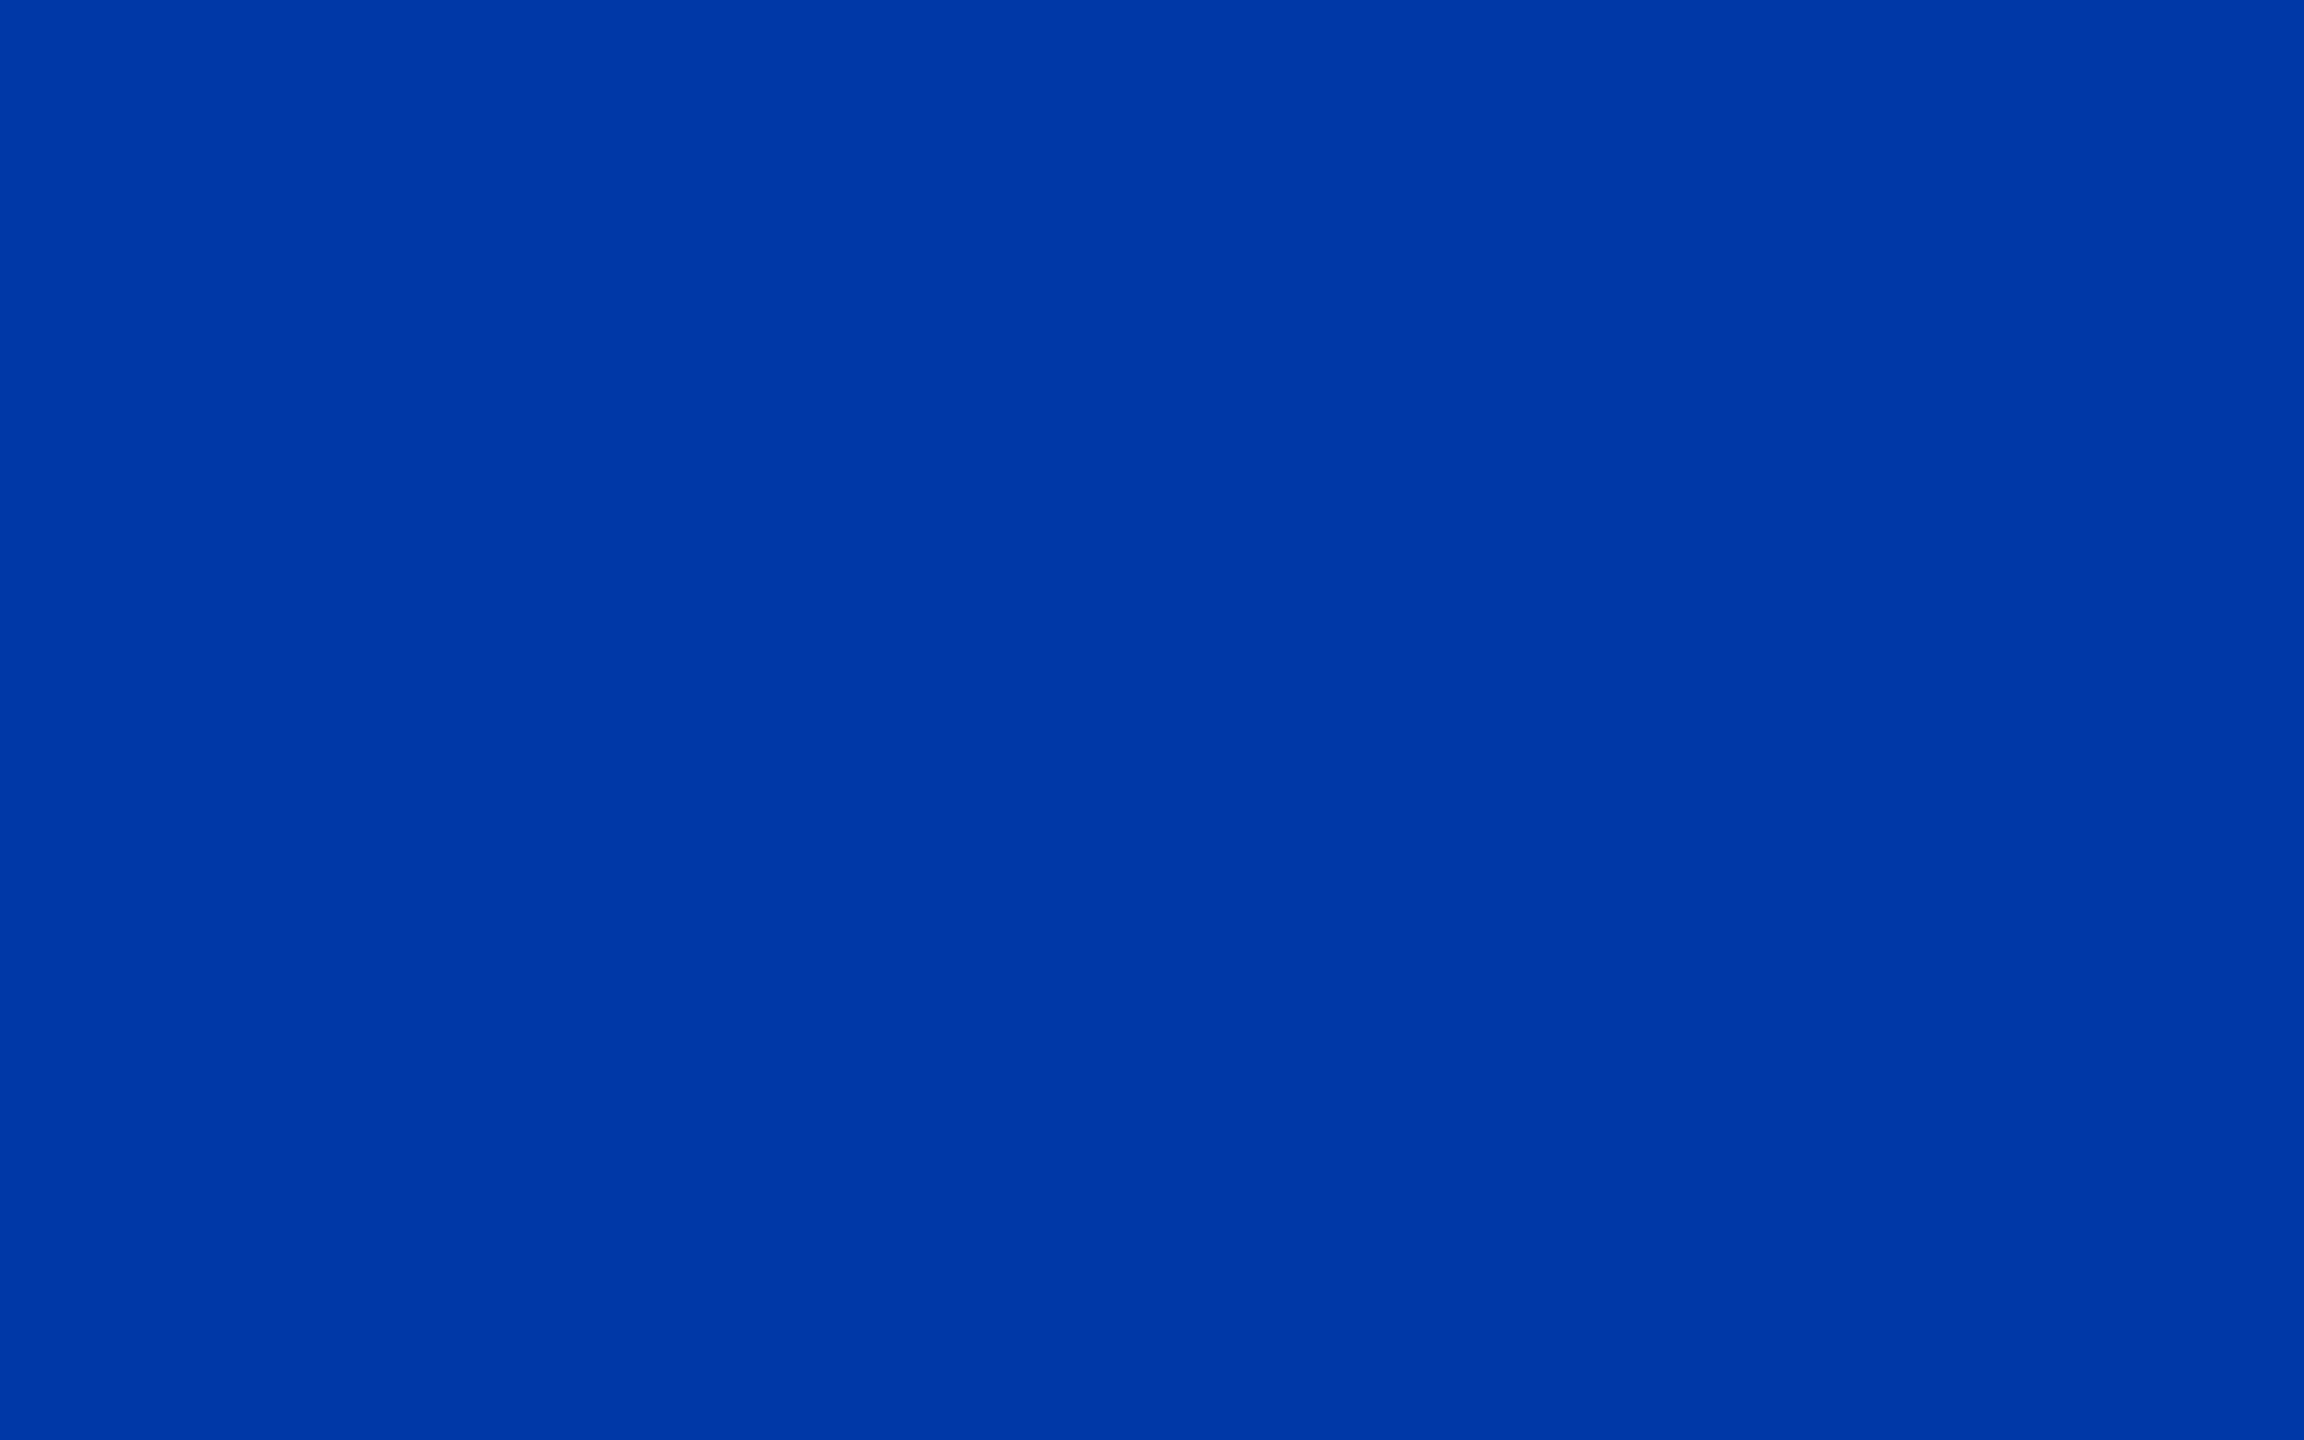 2304x1440 Royal Azure Solid Color Background